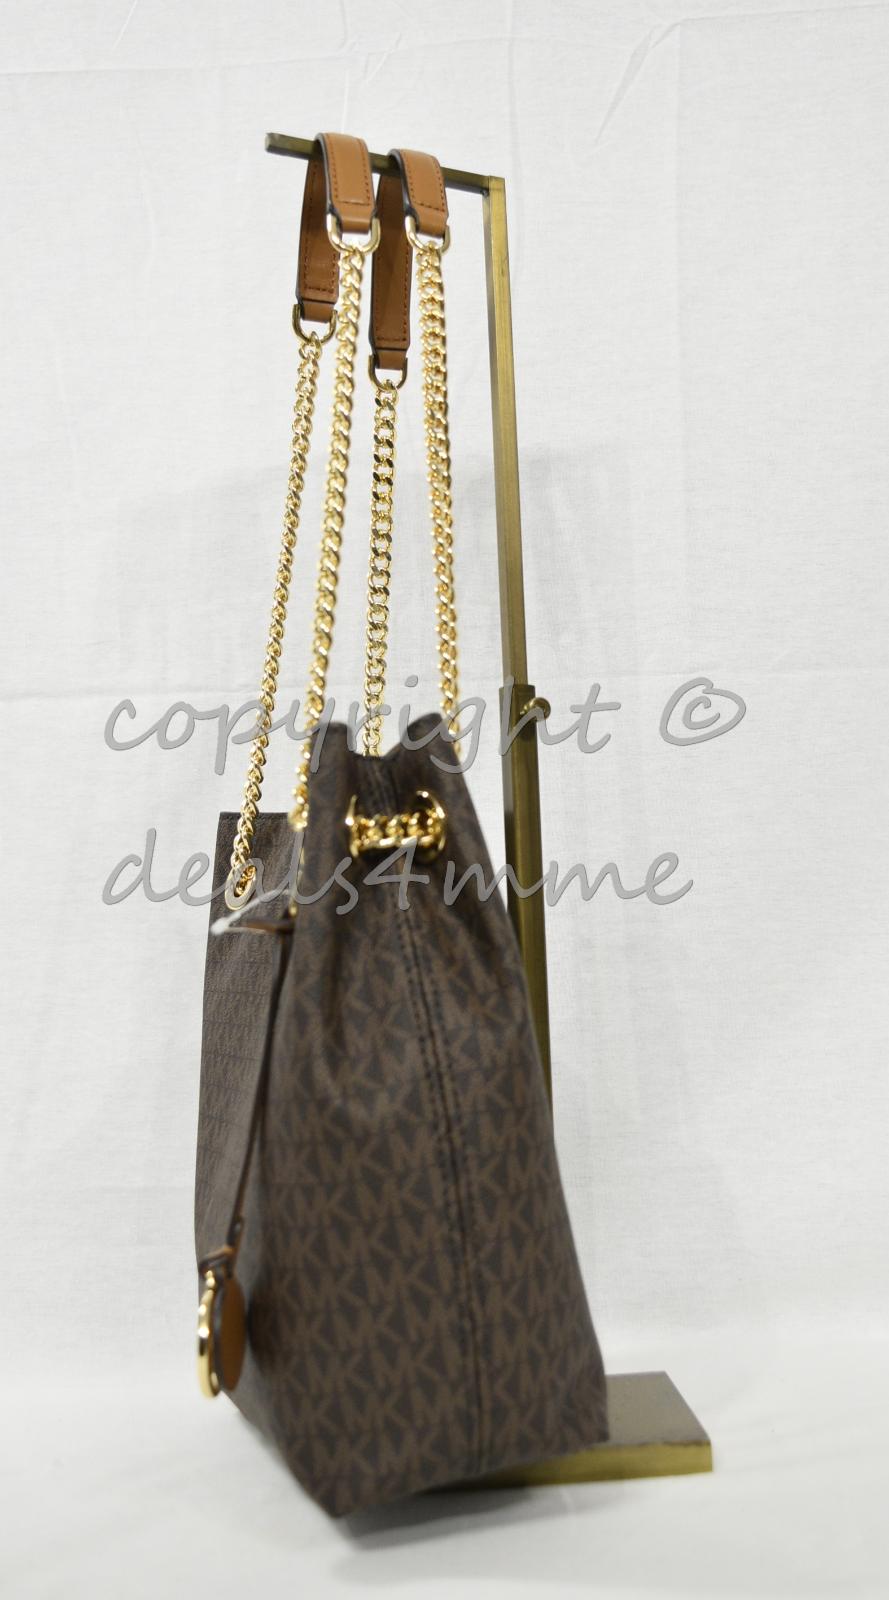 017903b3e4b9 NWT Michael Kors Signature 'MK' Jet Set Medium Chain Shoulder  Tote/Crossbody Bag